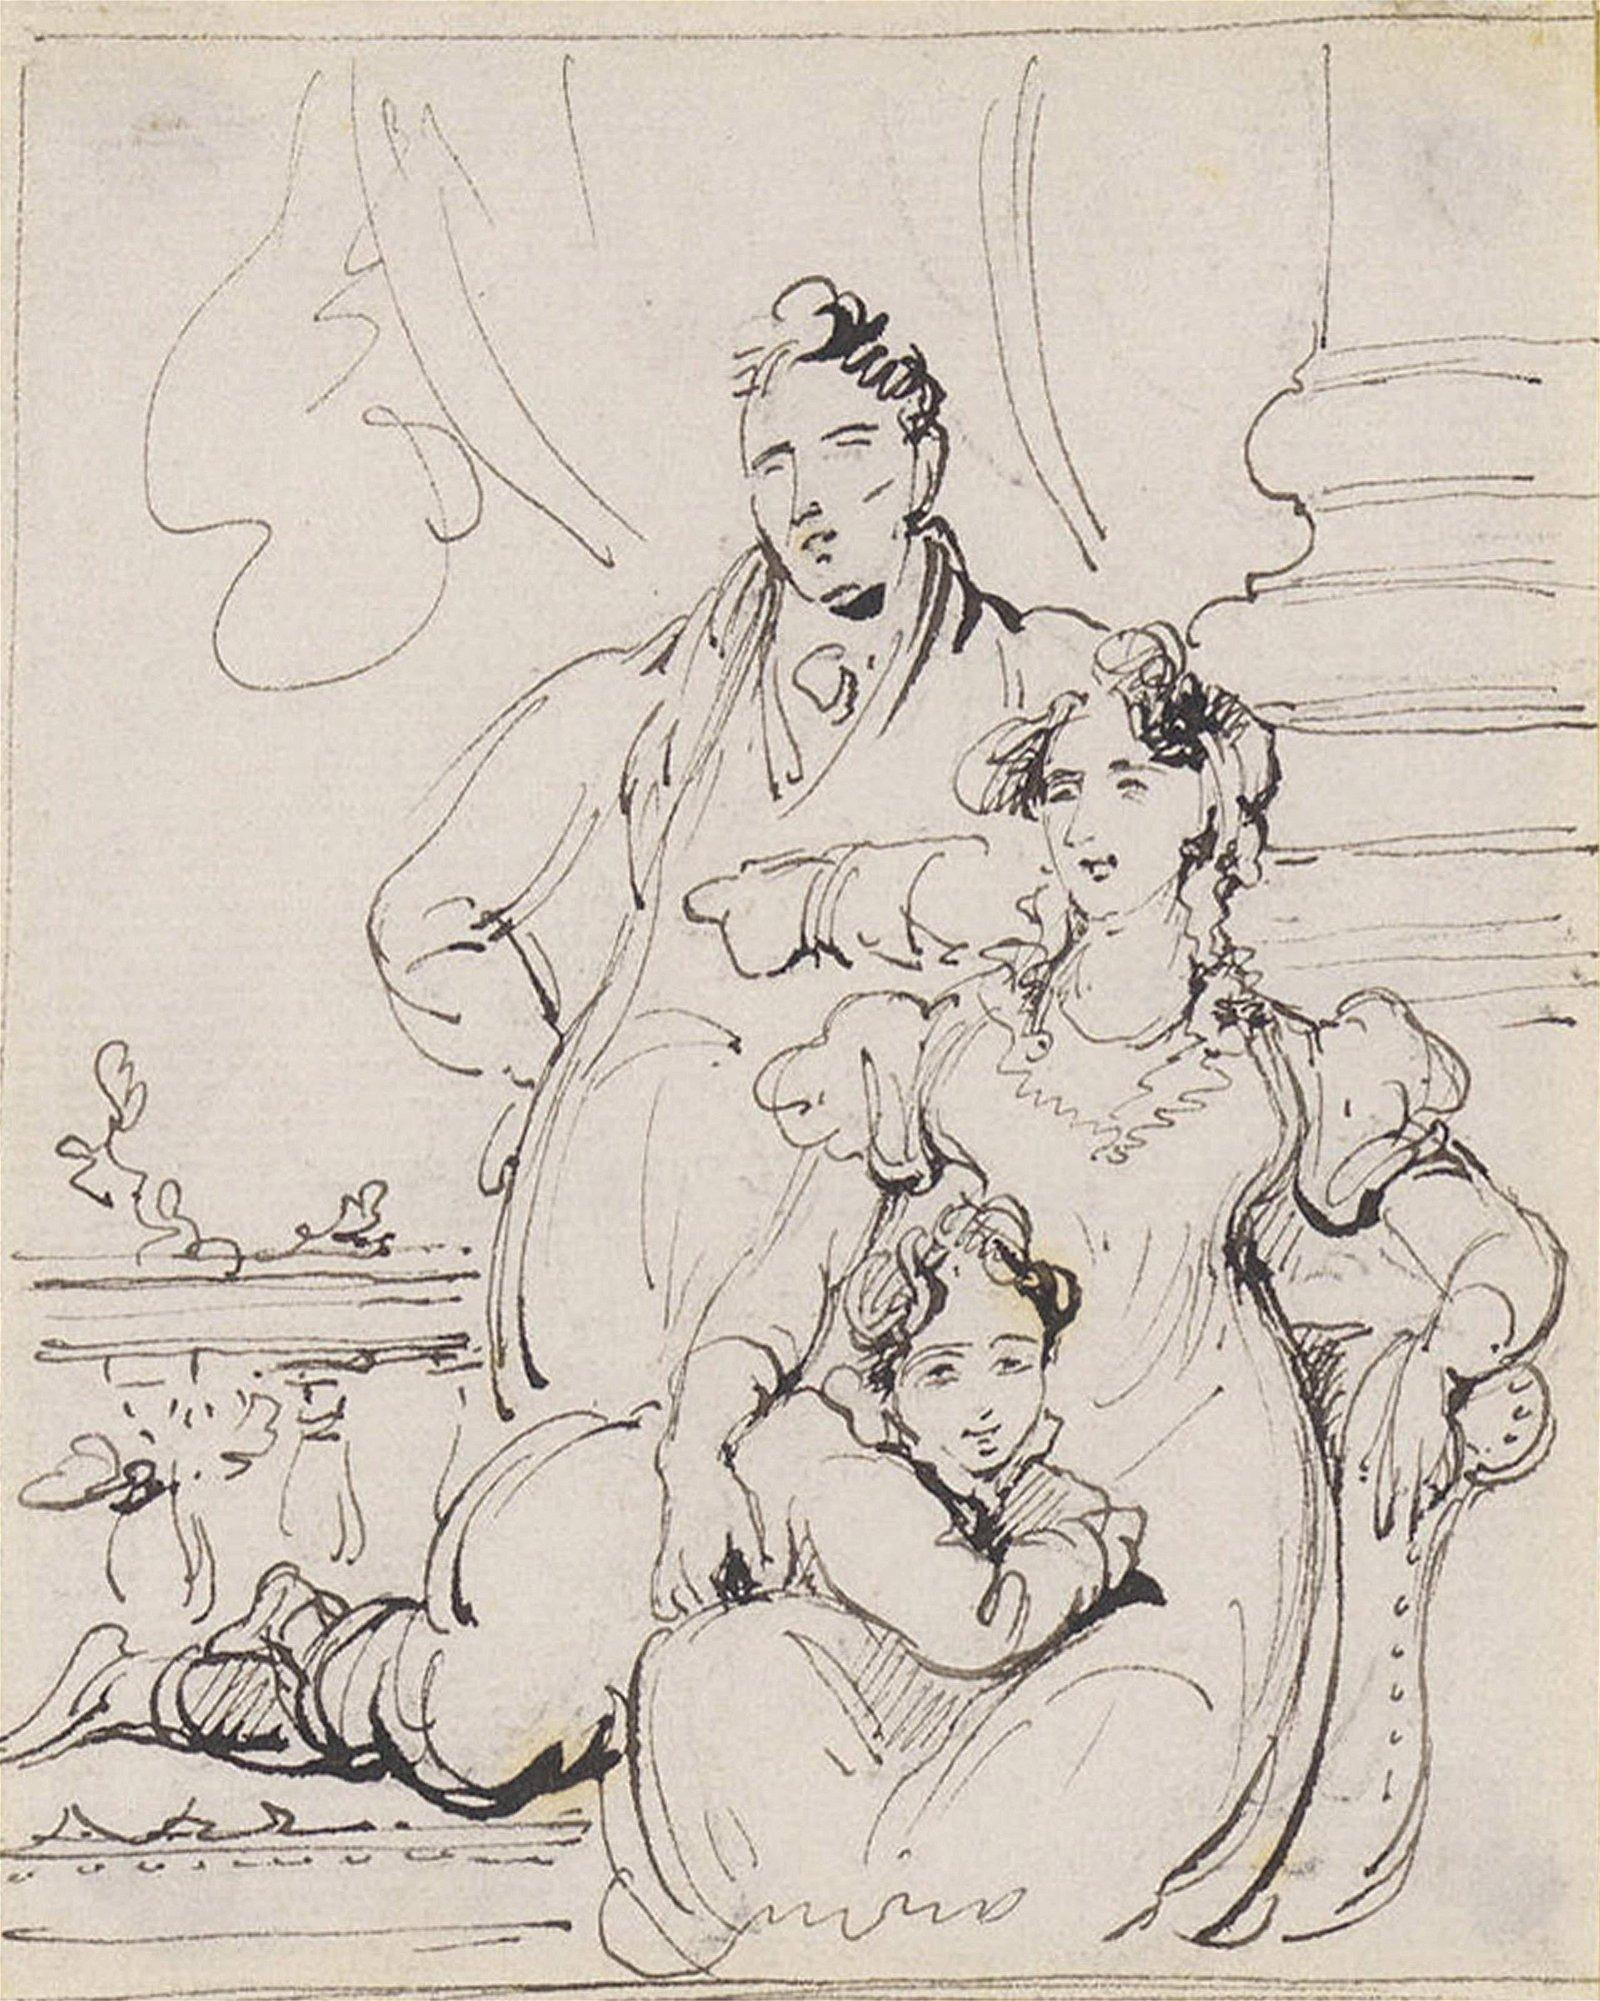 George Chinnery (London 1774-1852 Macau, China)